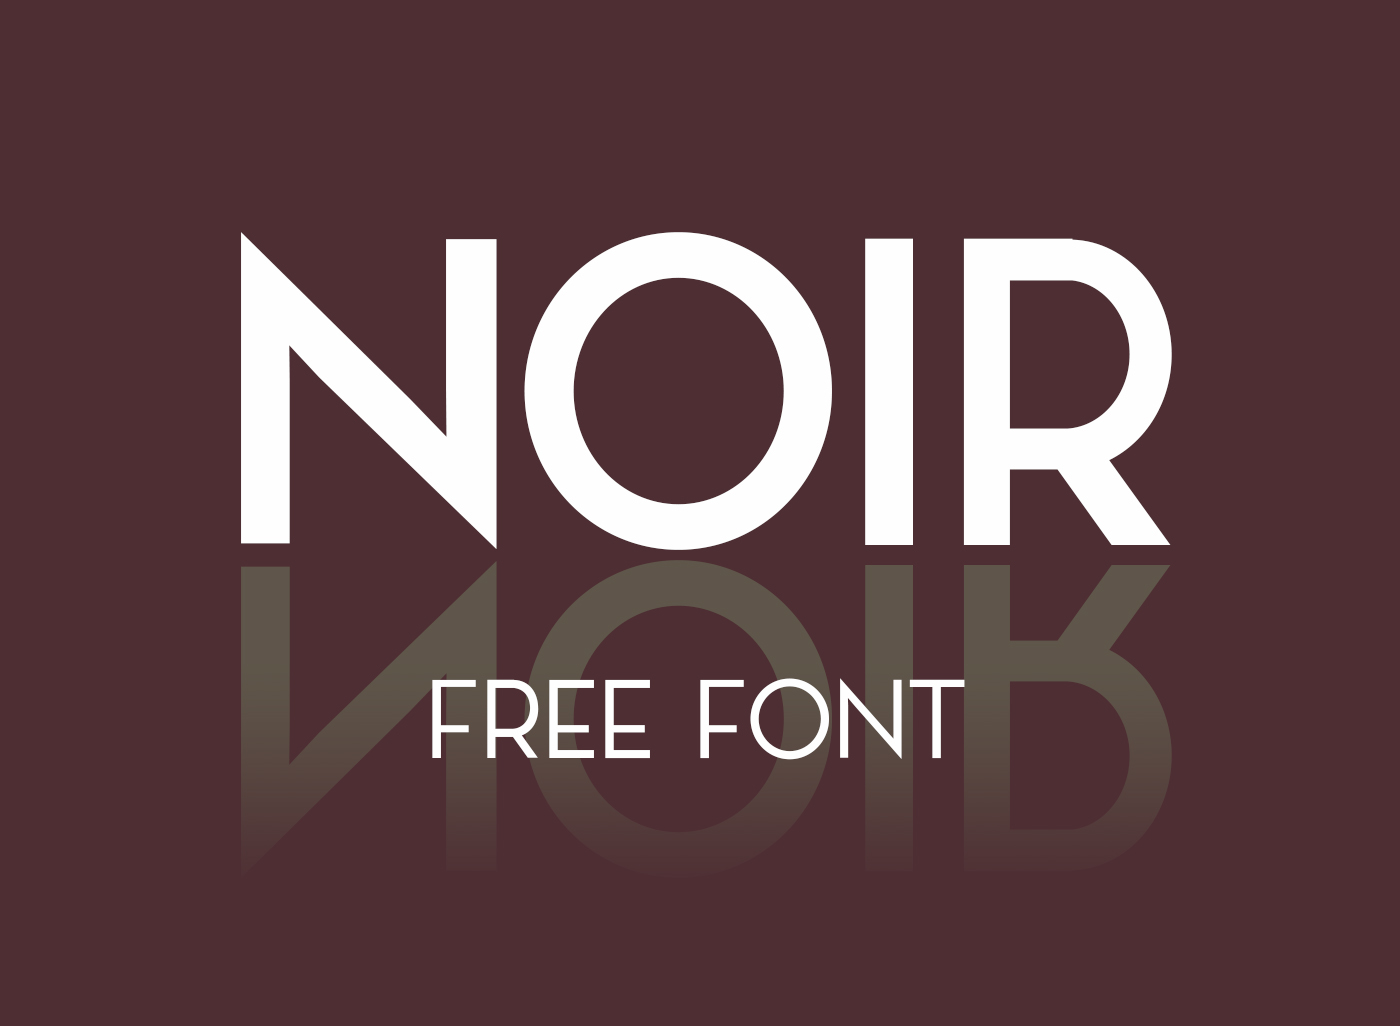 Noir Free Typeface Free Fonts